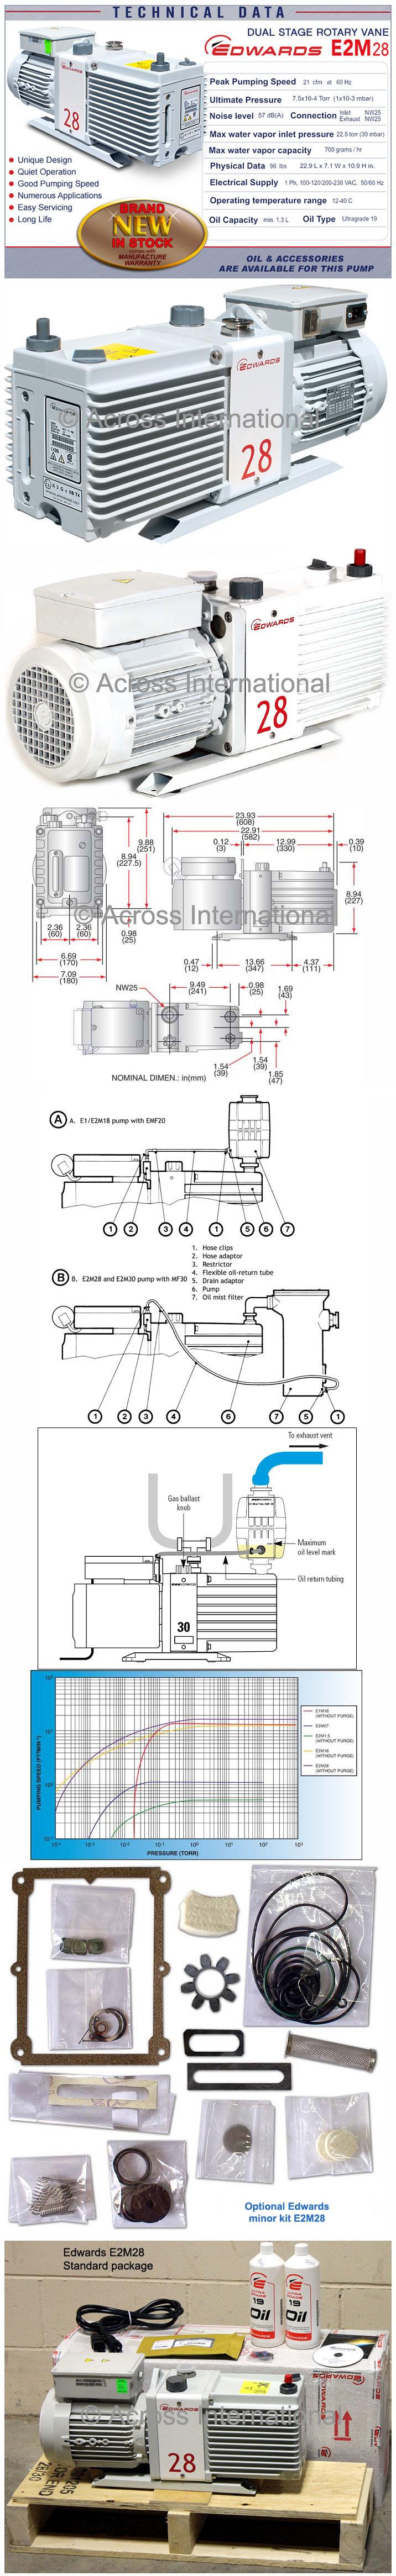 Edwards E2m28 21 Cfm 2 Stage High Capacity Vacuum Pump W